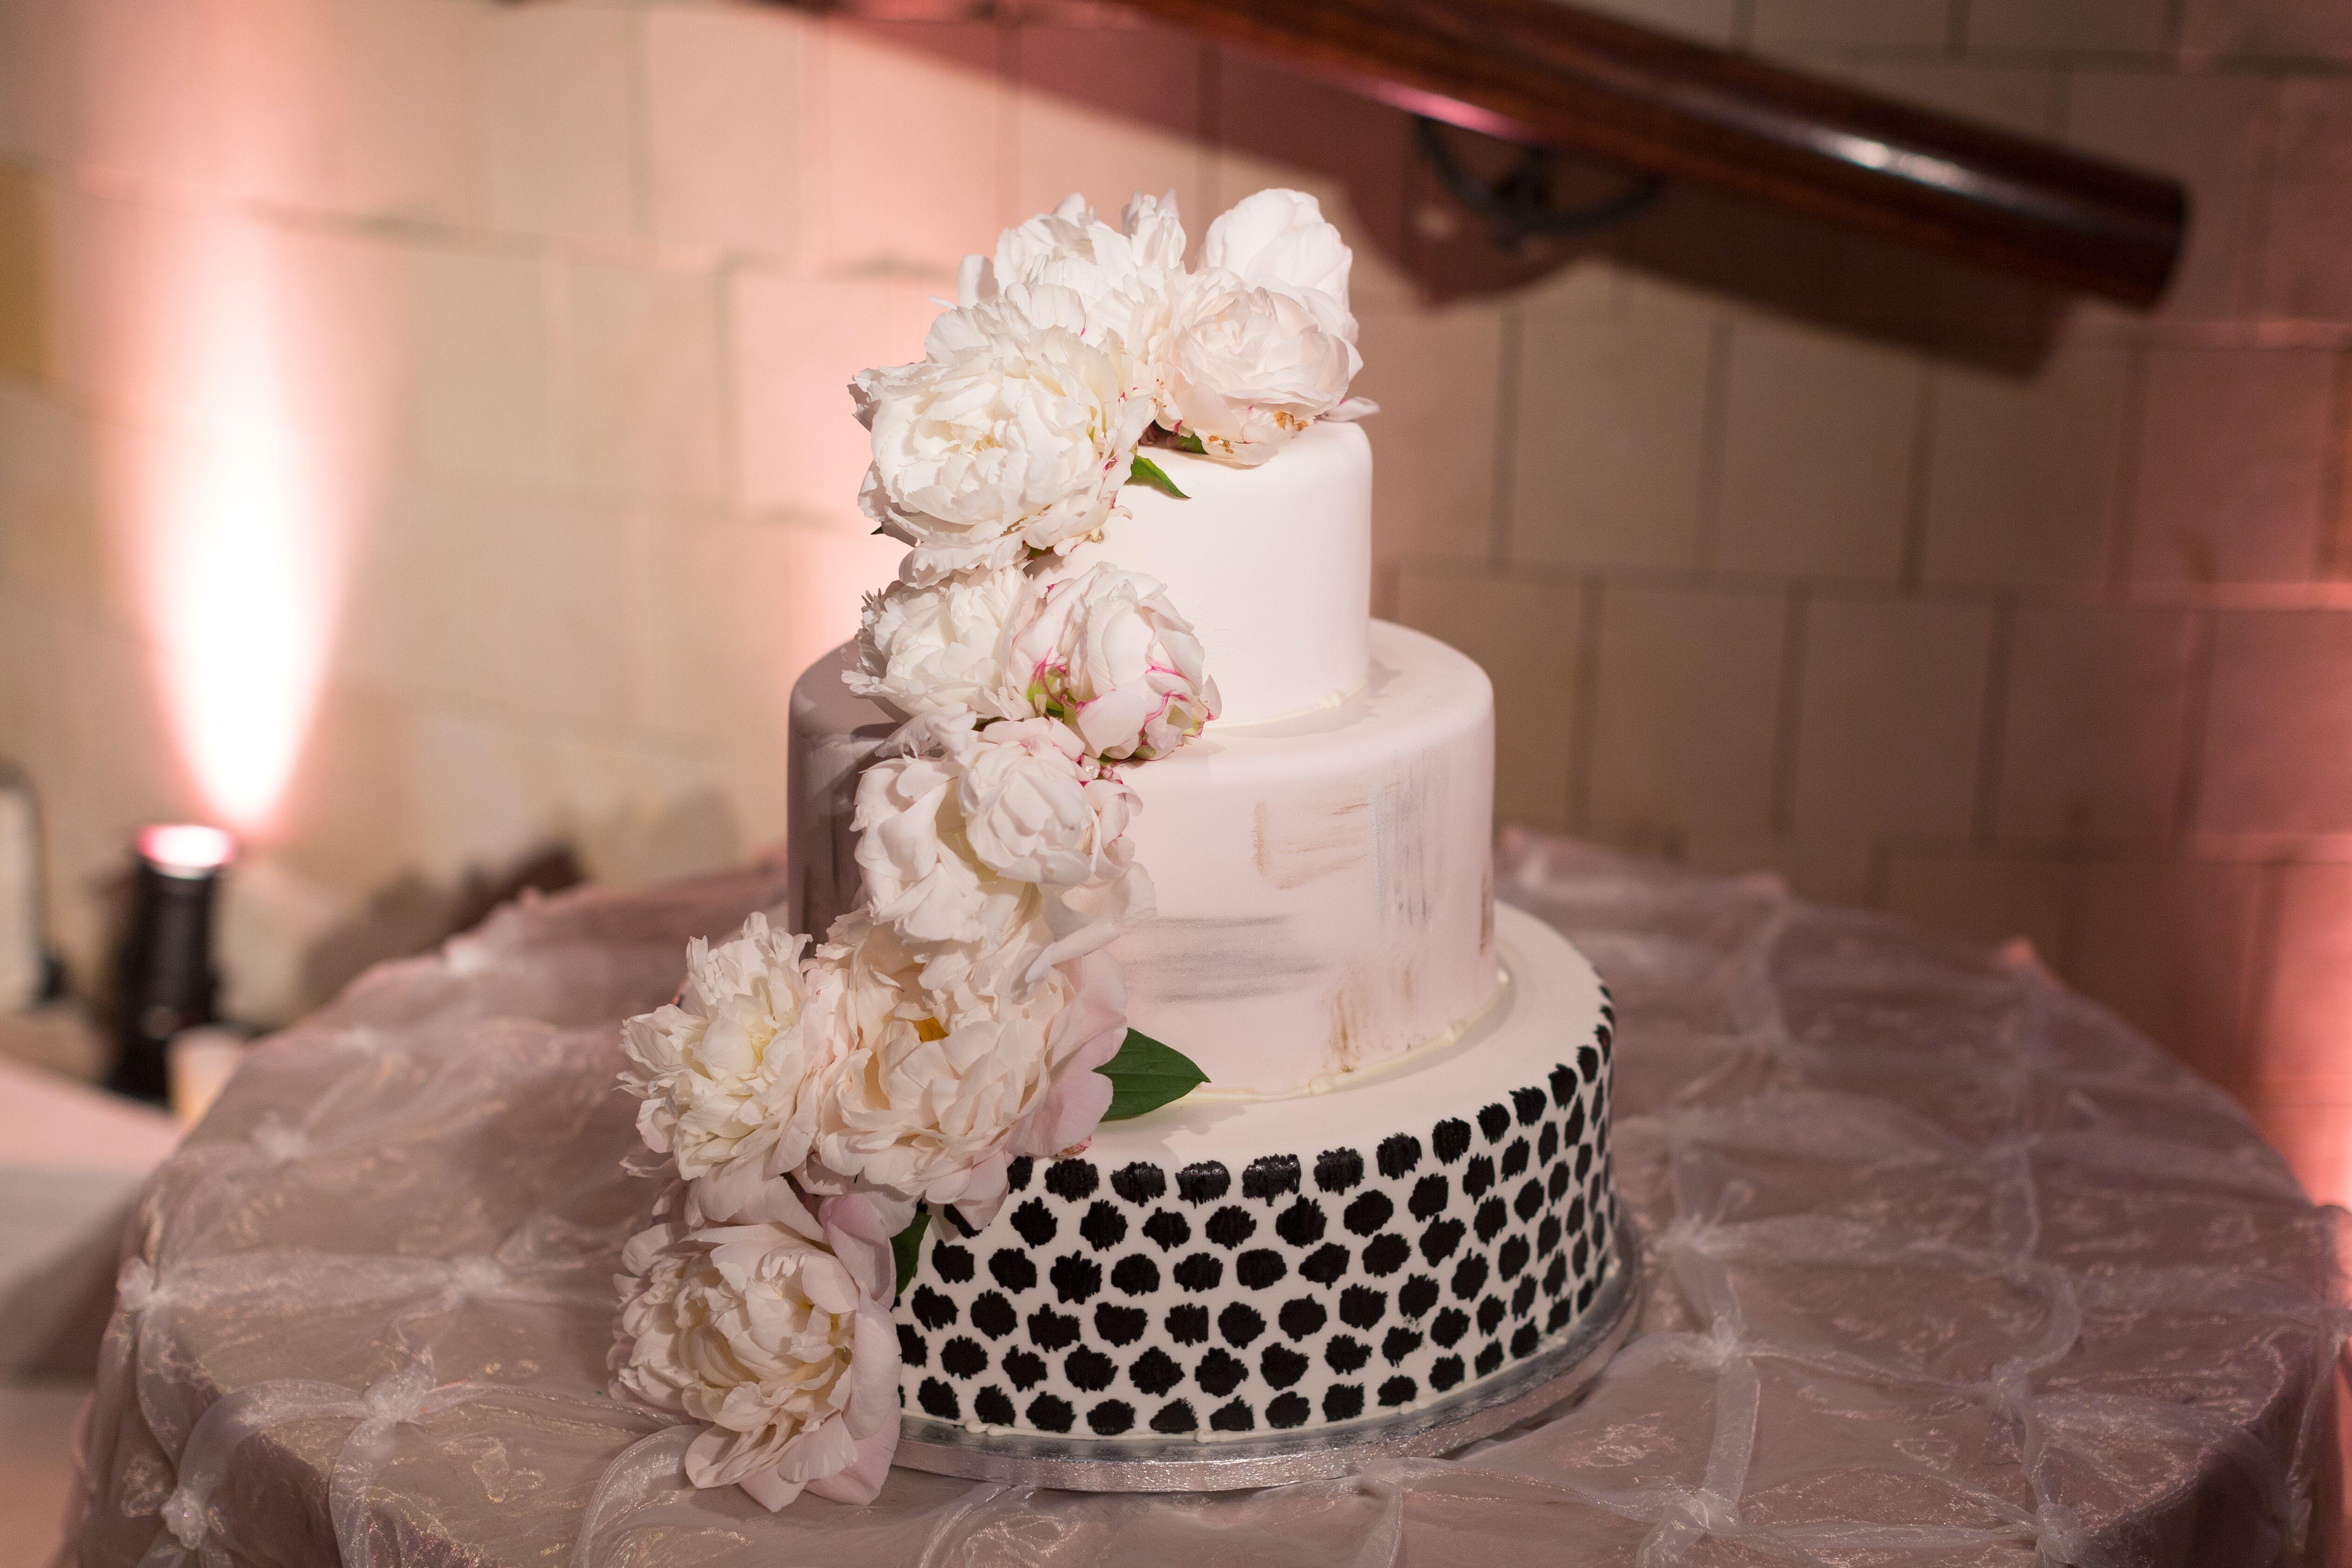 Black Blush And White Wedding Cake